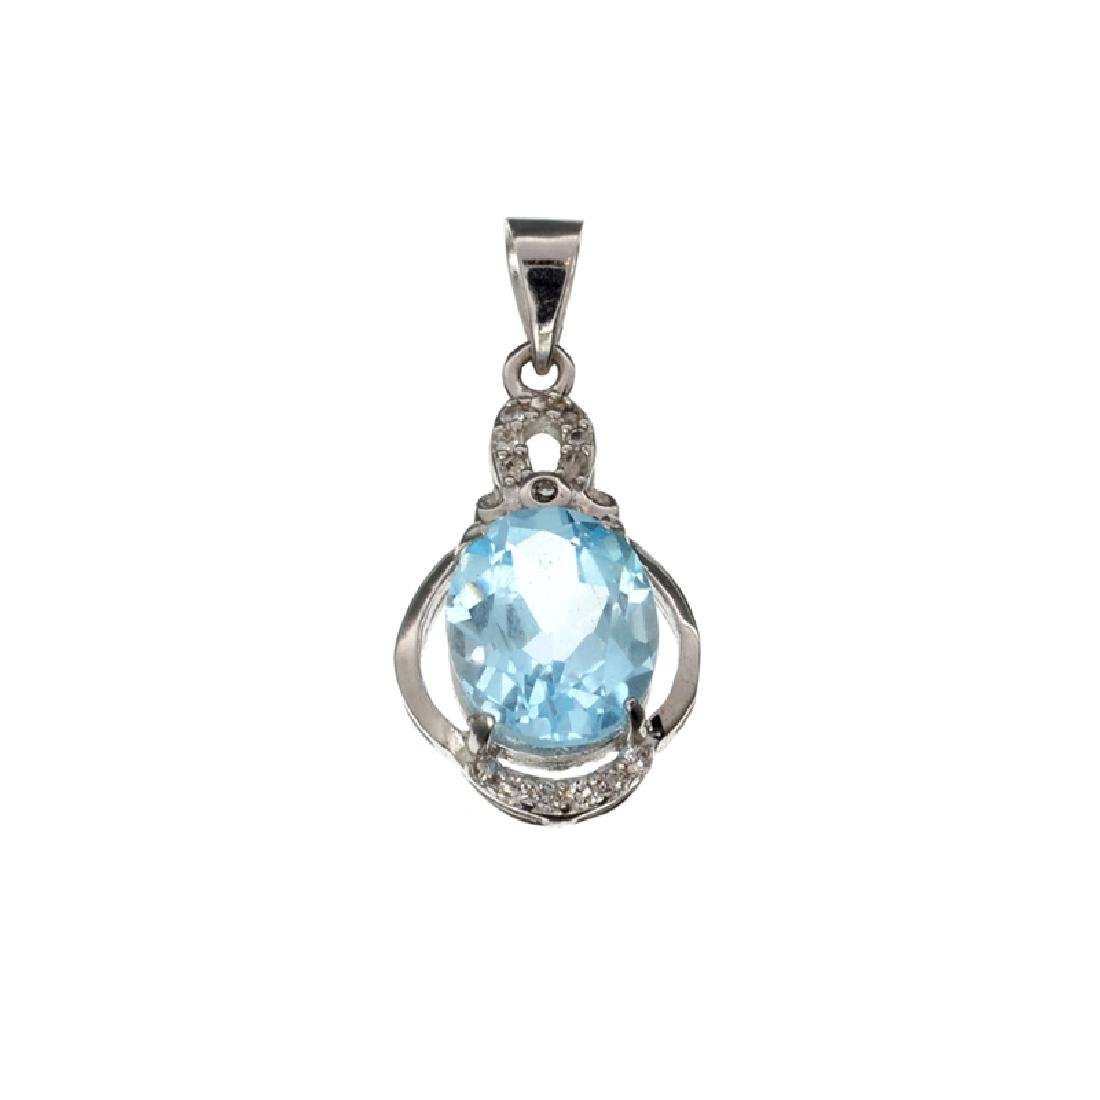 APP: 0.5k Fine Jewelry 4.55CT Blue Topaz And White